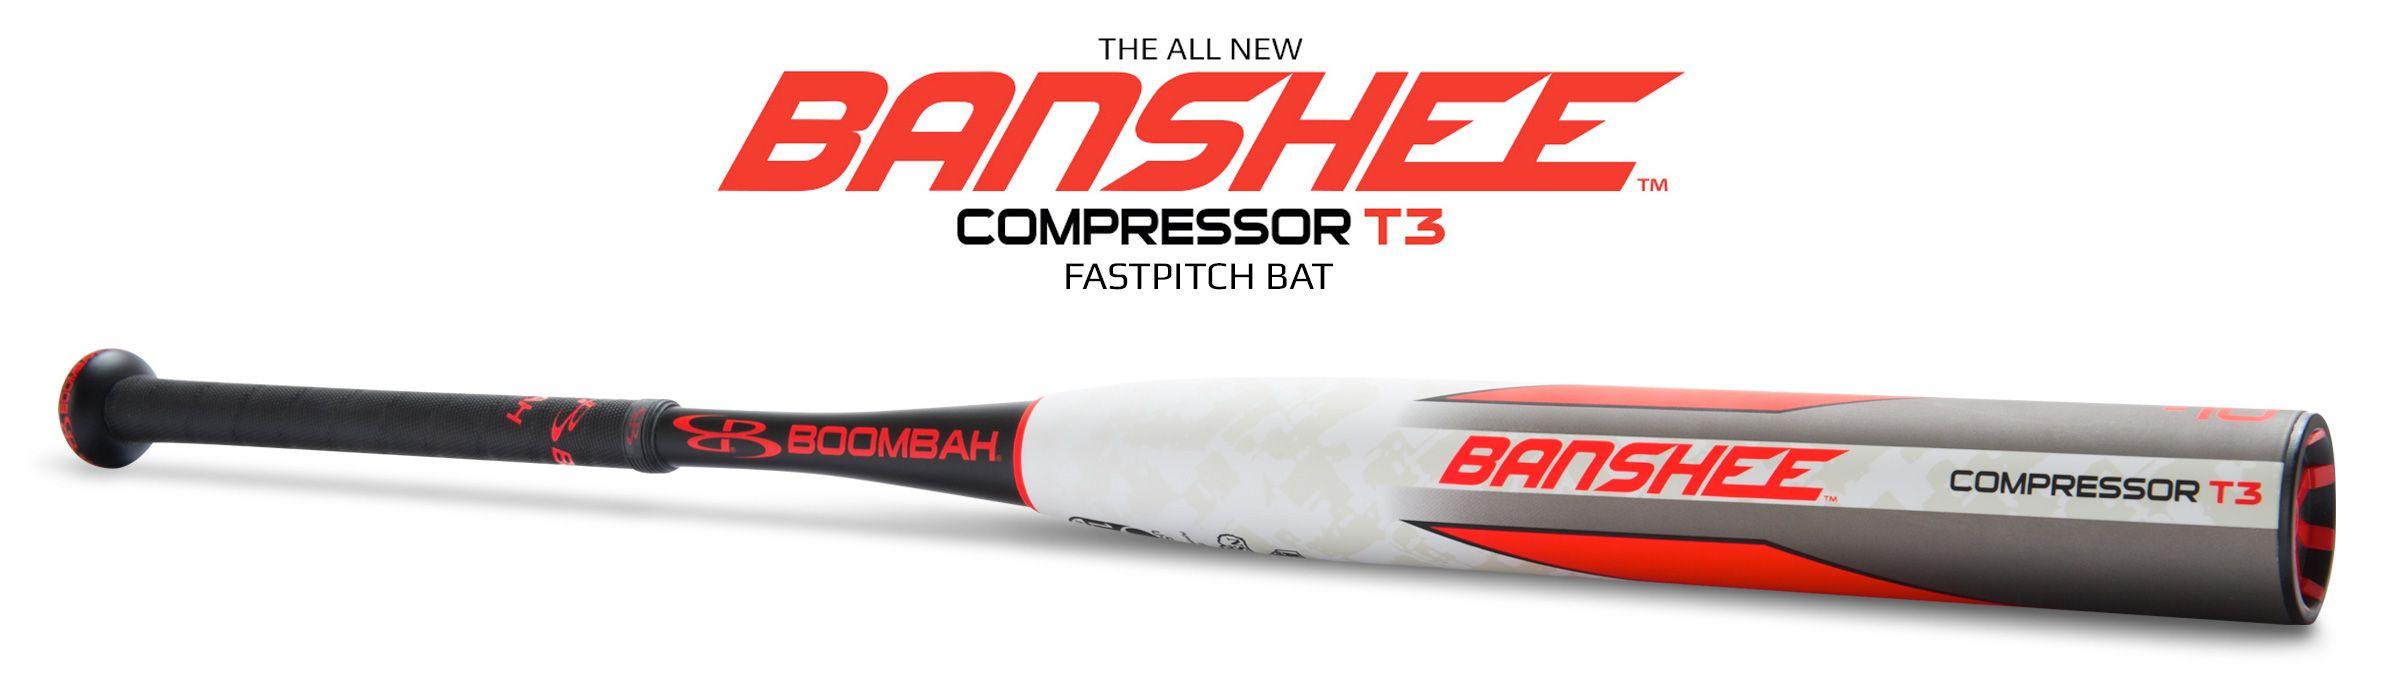 Boombah Banshee Fastpitch Bat